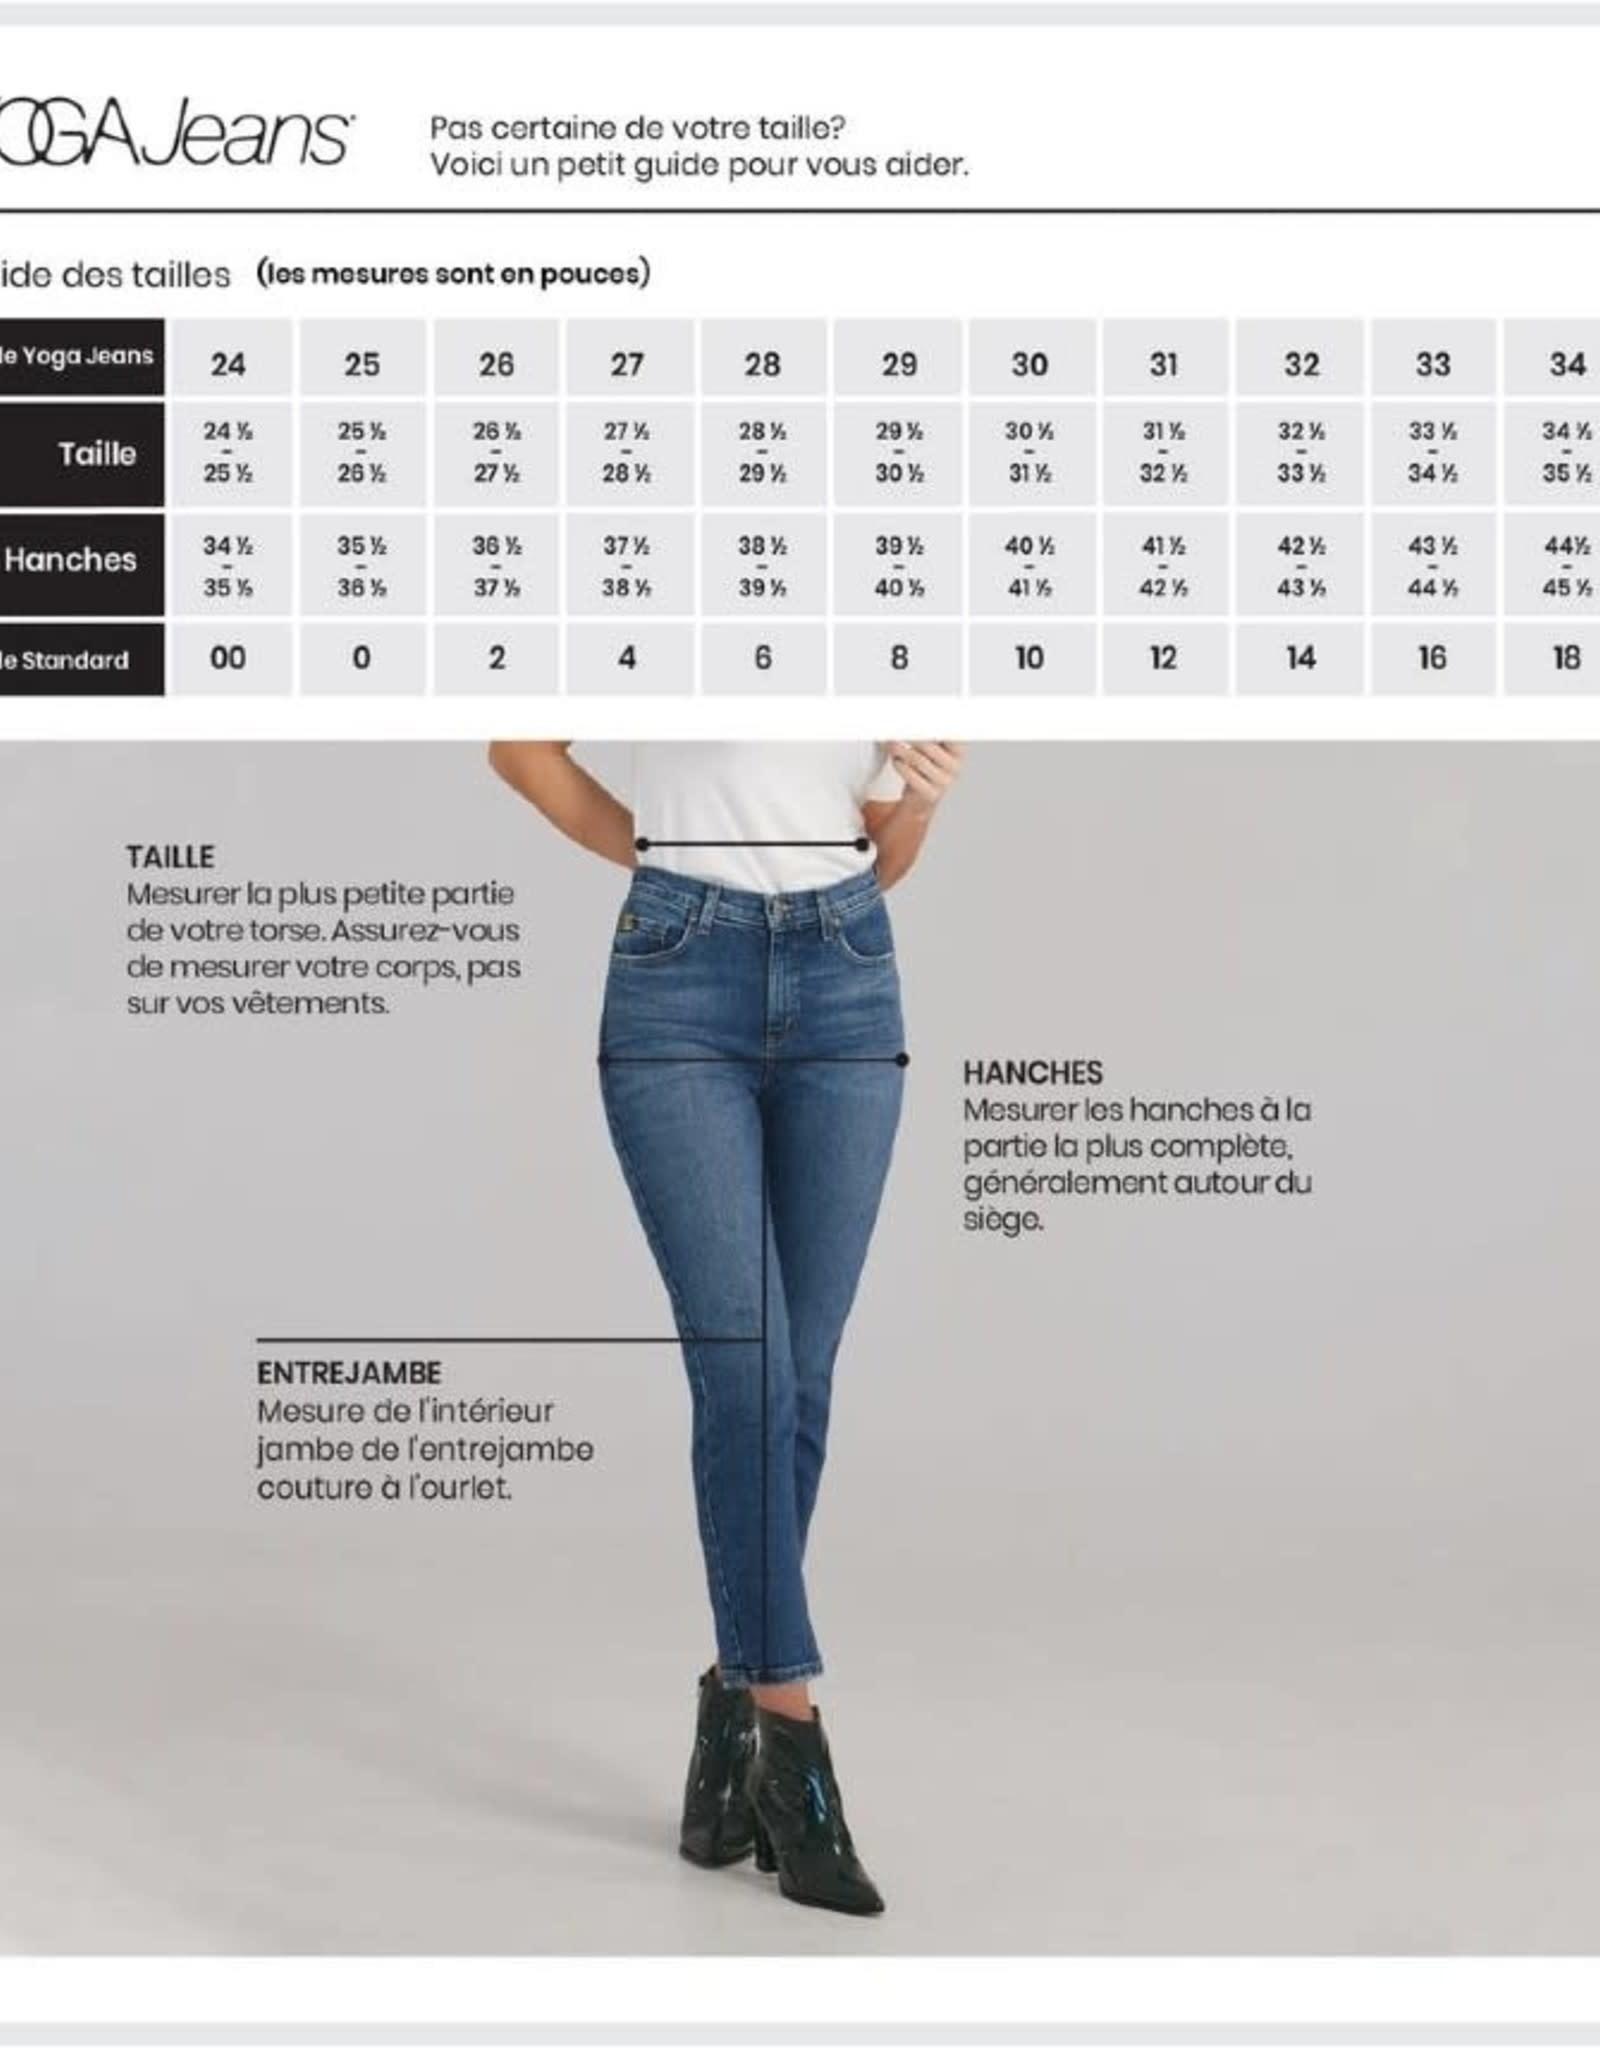 Yoga Jeans Classic Rise Skinny 1582 Yoga Jeans